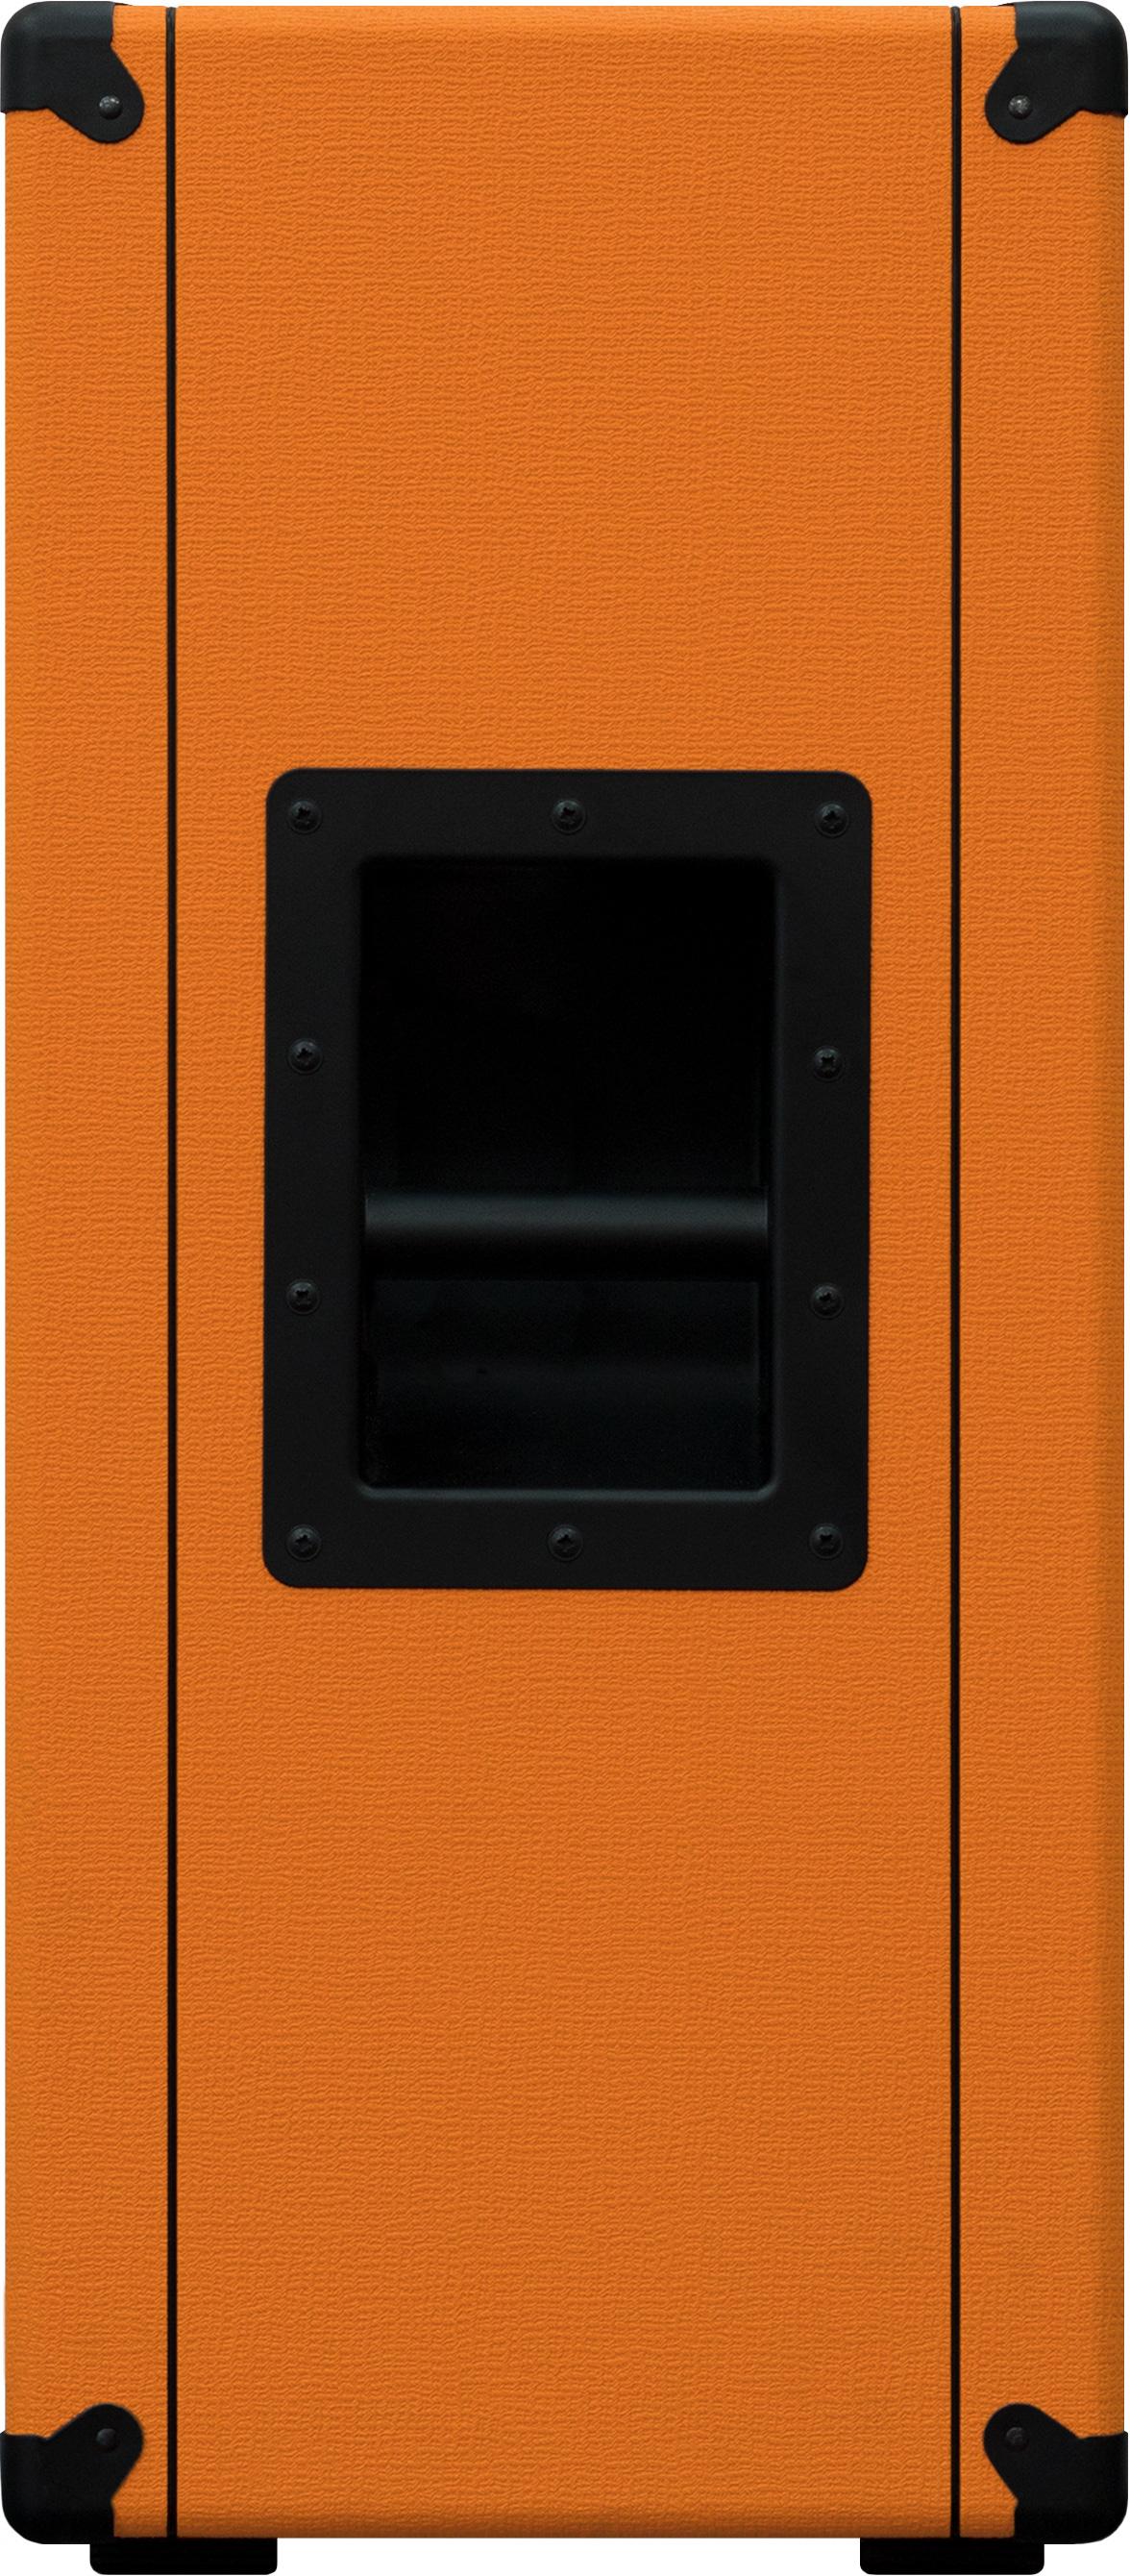 Orange-PPC212V-2x12-Inch-Vertical-Guitar-Amplifier-Cabinet thumbnail 3